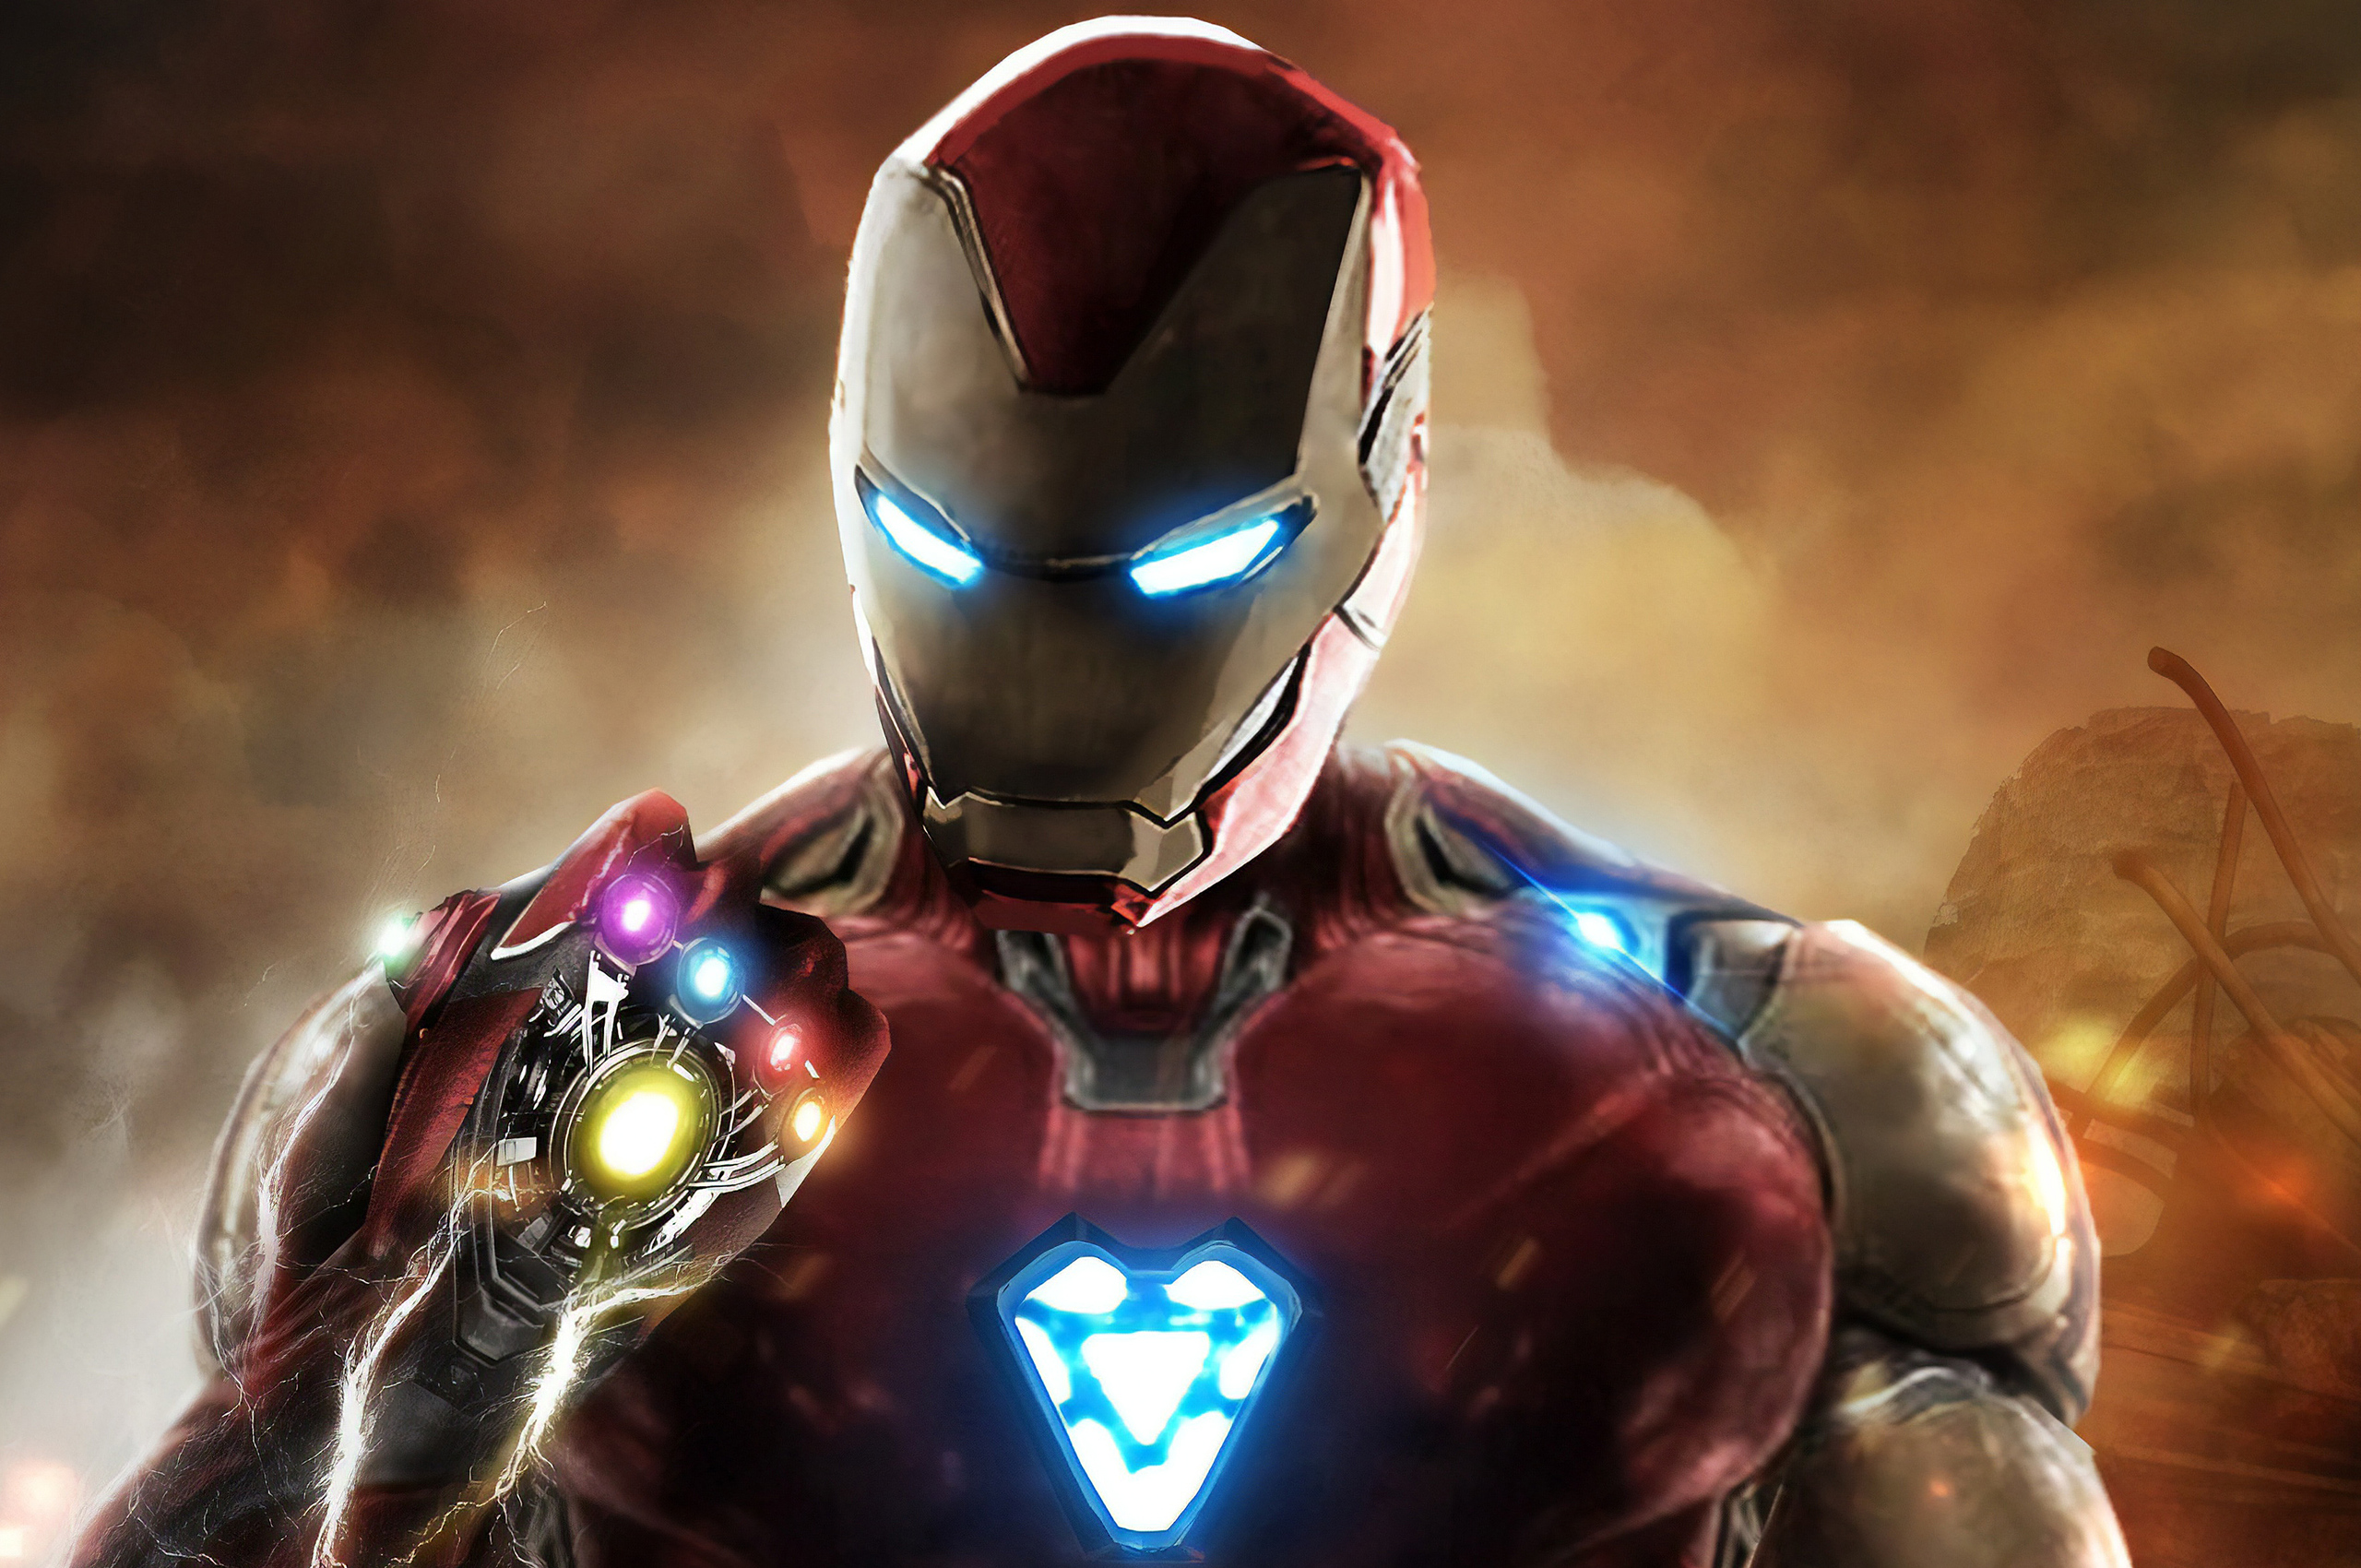 iron-man-infinity-gauntlet-avengers-endgame-nj.jpg